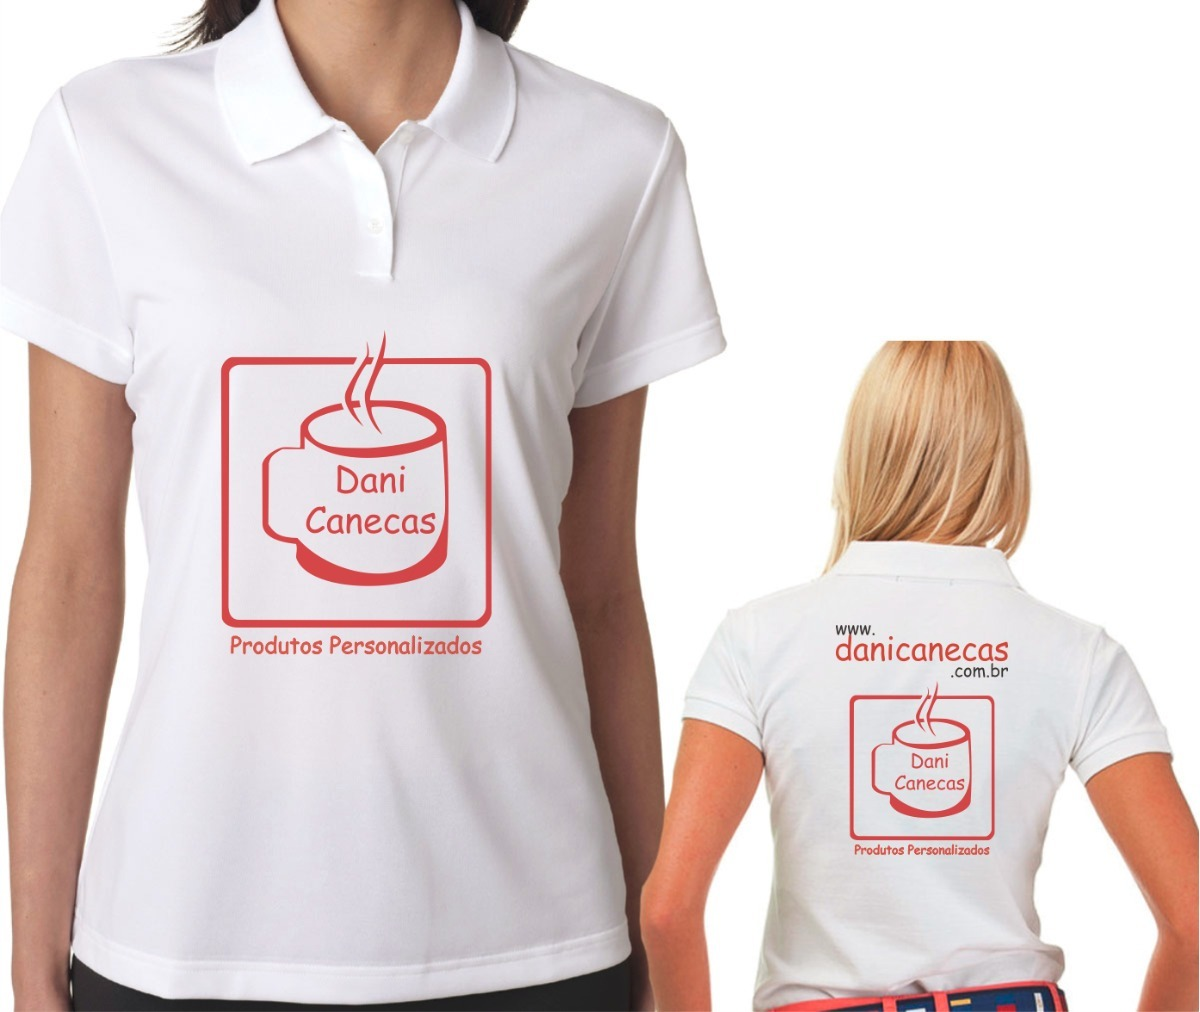 b71239f1b5 Kit Com 20 Camisetas Personalizadas Gola Polo Bblook Branca - R  400 ...